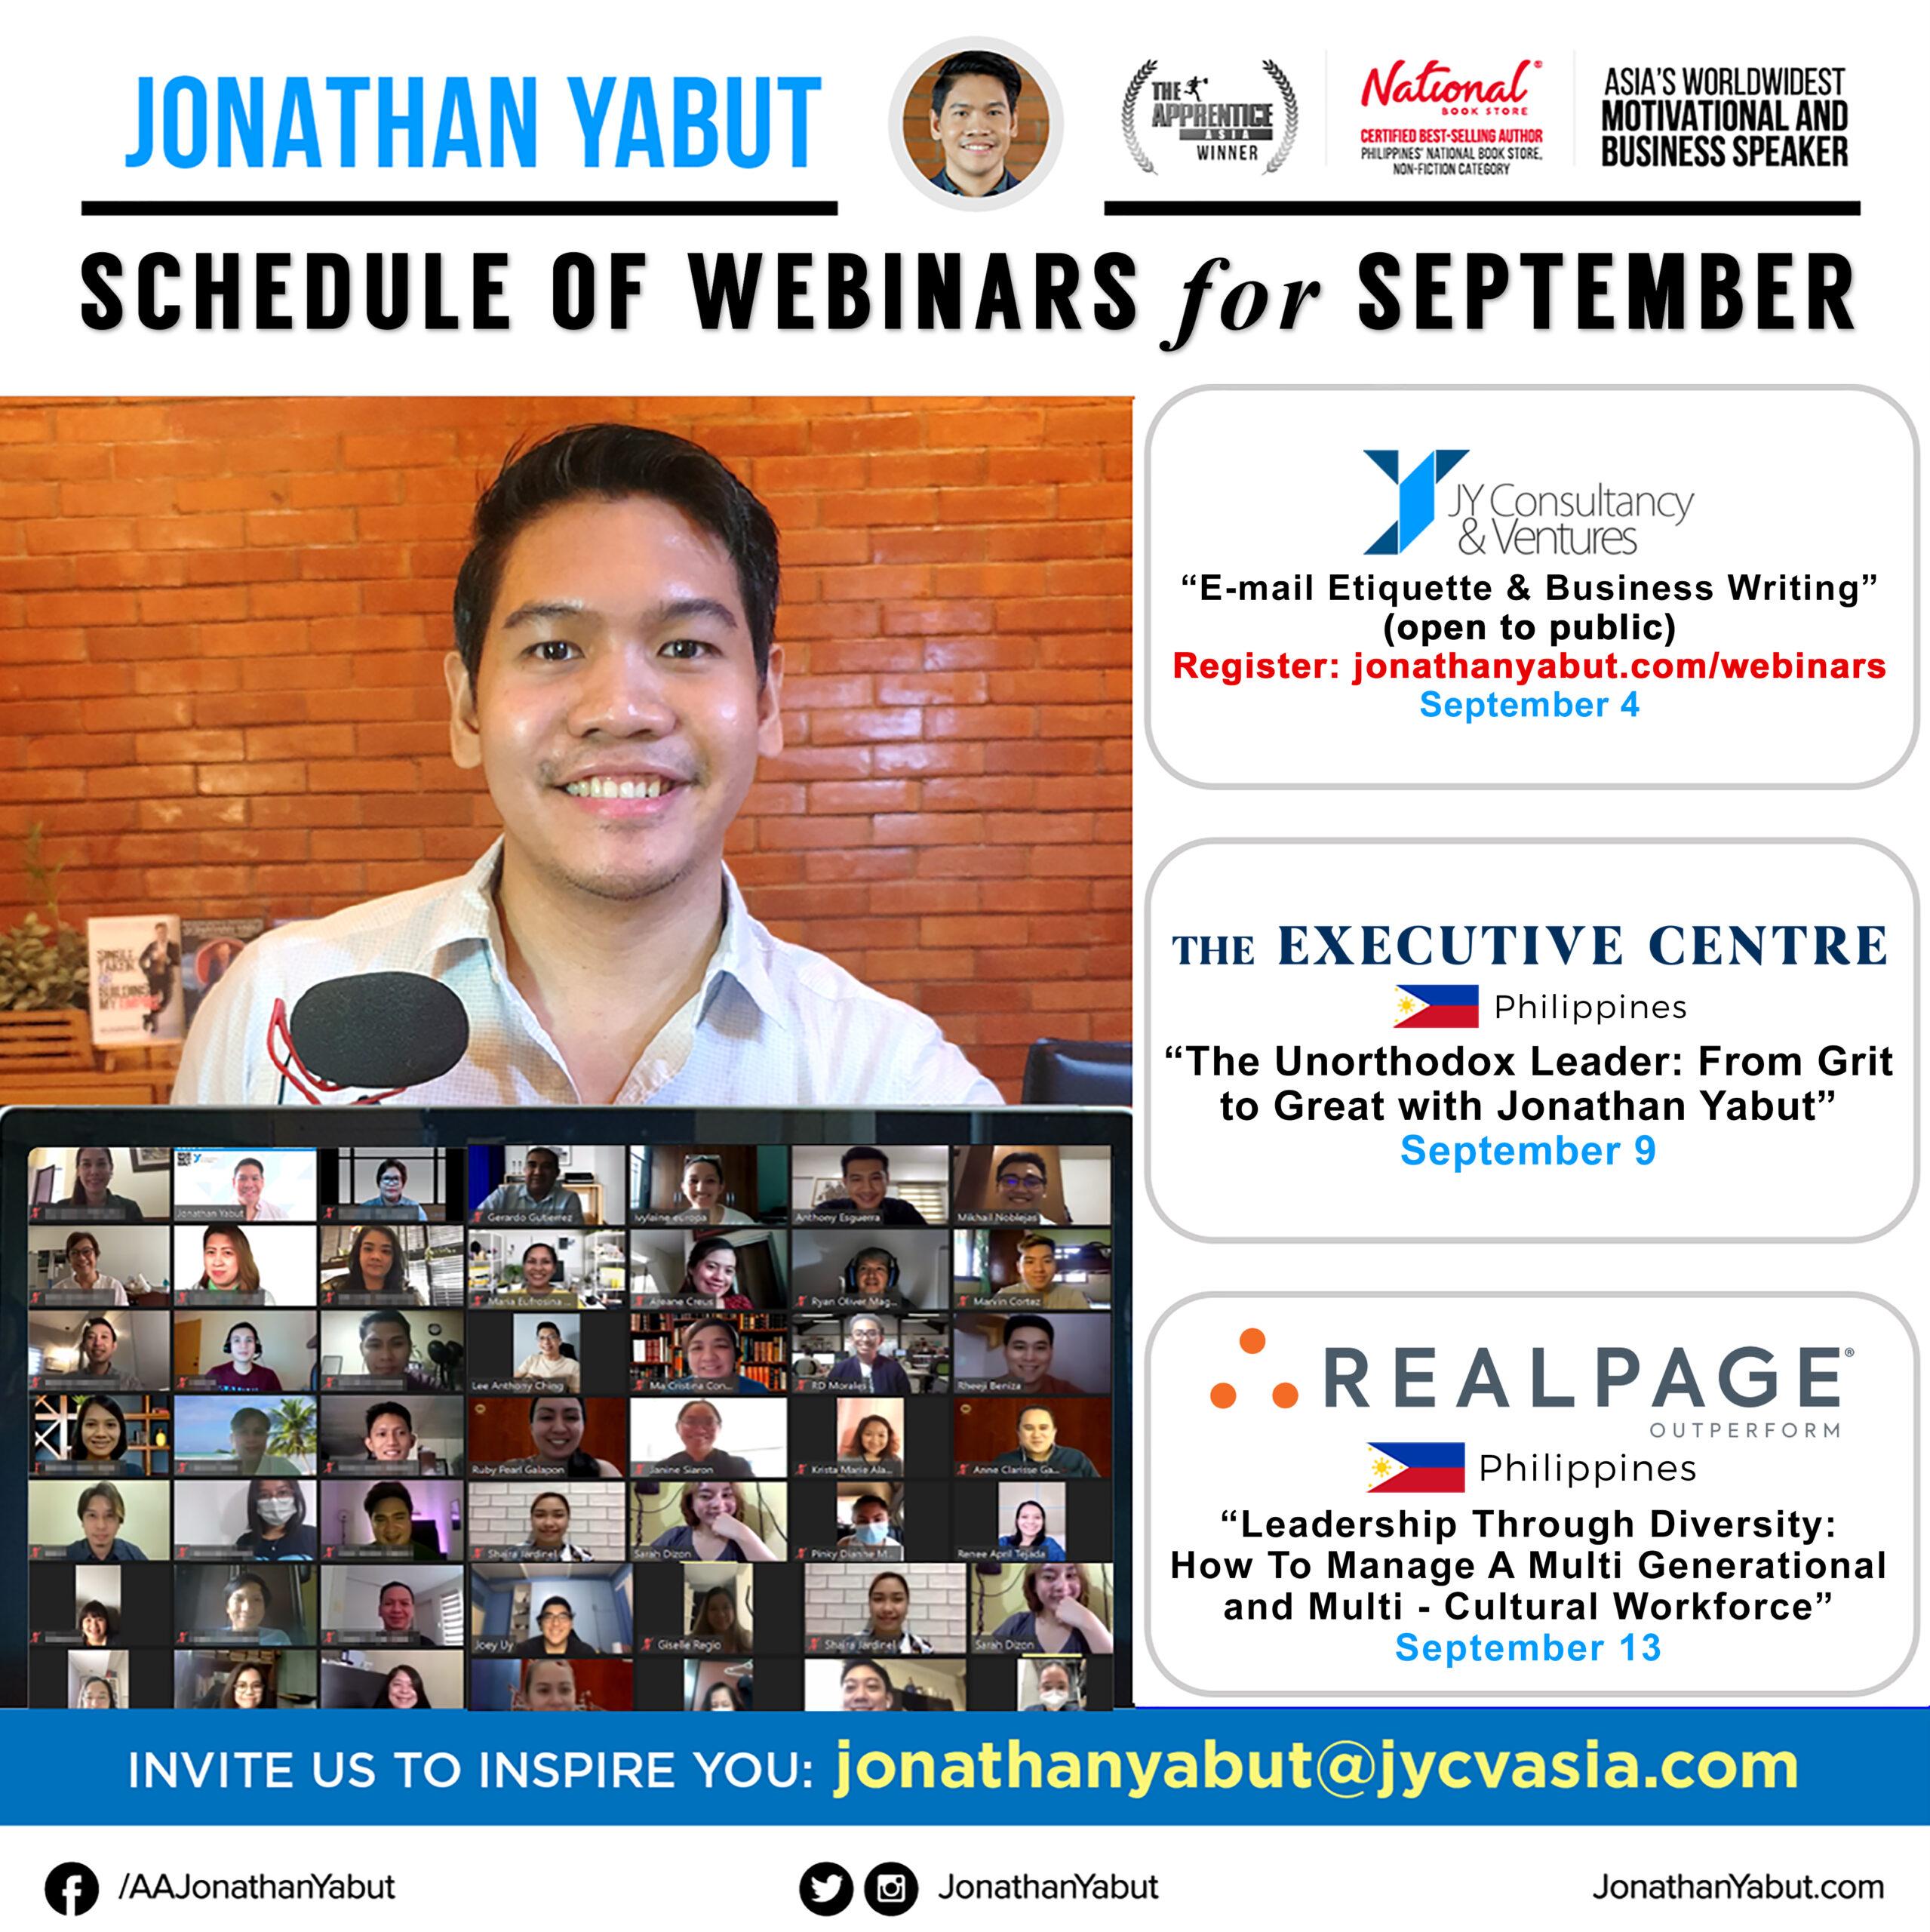 Jonathan Yabut motivational speaker asia philippines September webinars 1 IG Feed